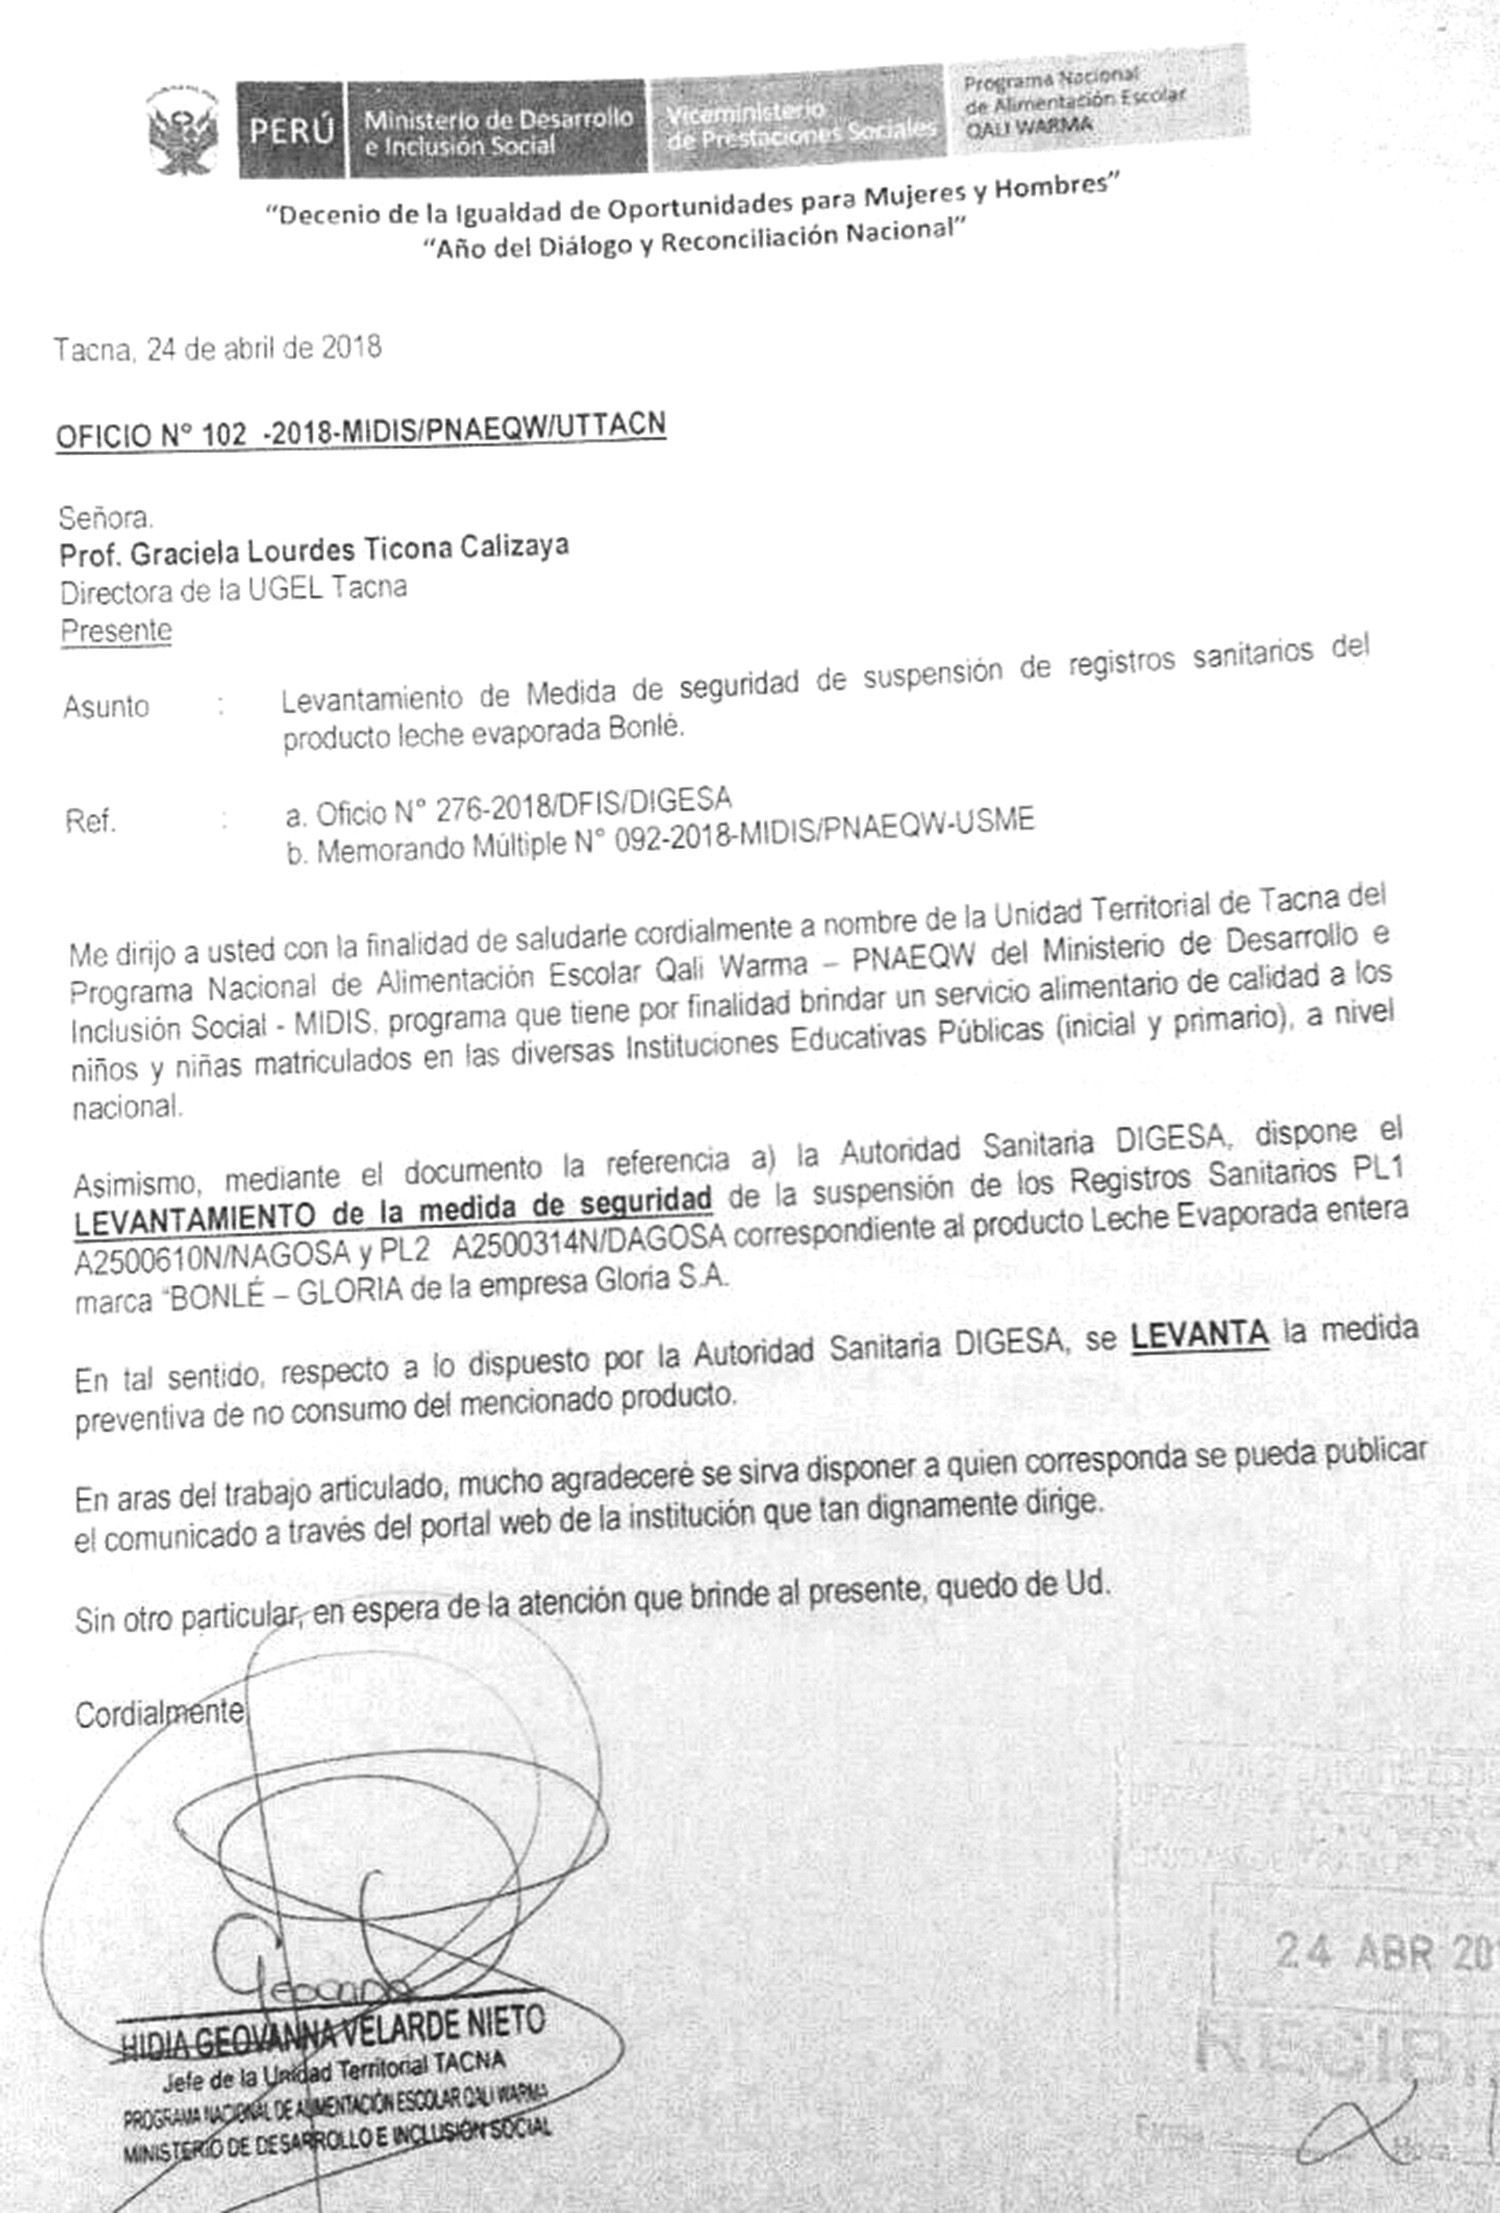 Calendario 2020 Con Feriados Bolivia Más Recientes Ugel Tacna Of Calendario 2020 Con Feriados Bolivia Más Actual Calaméo Deia